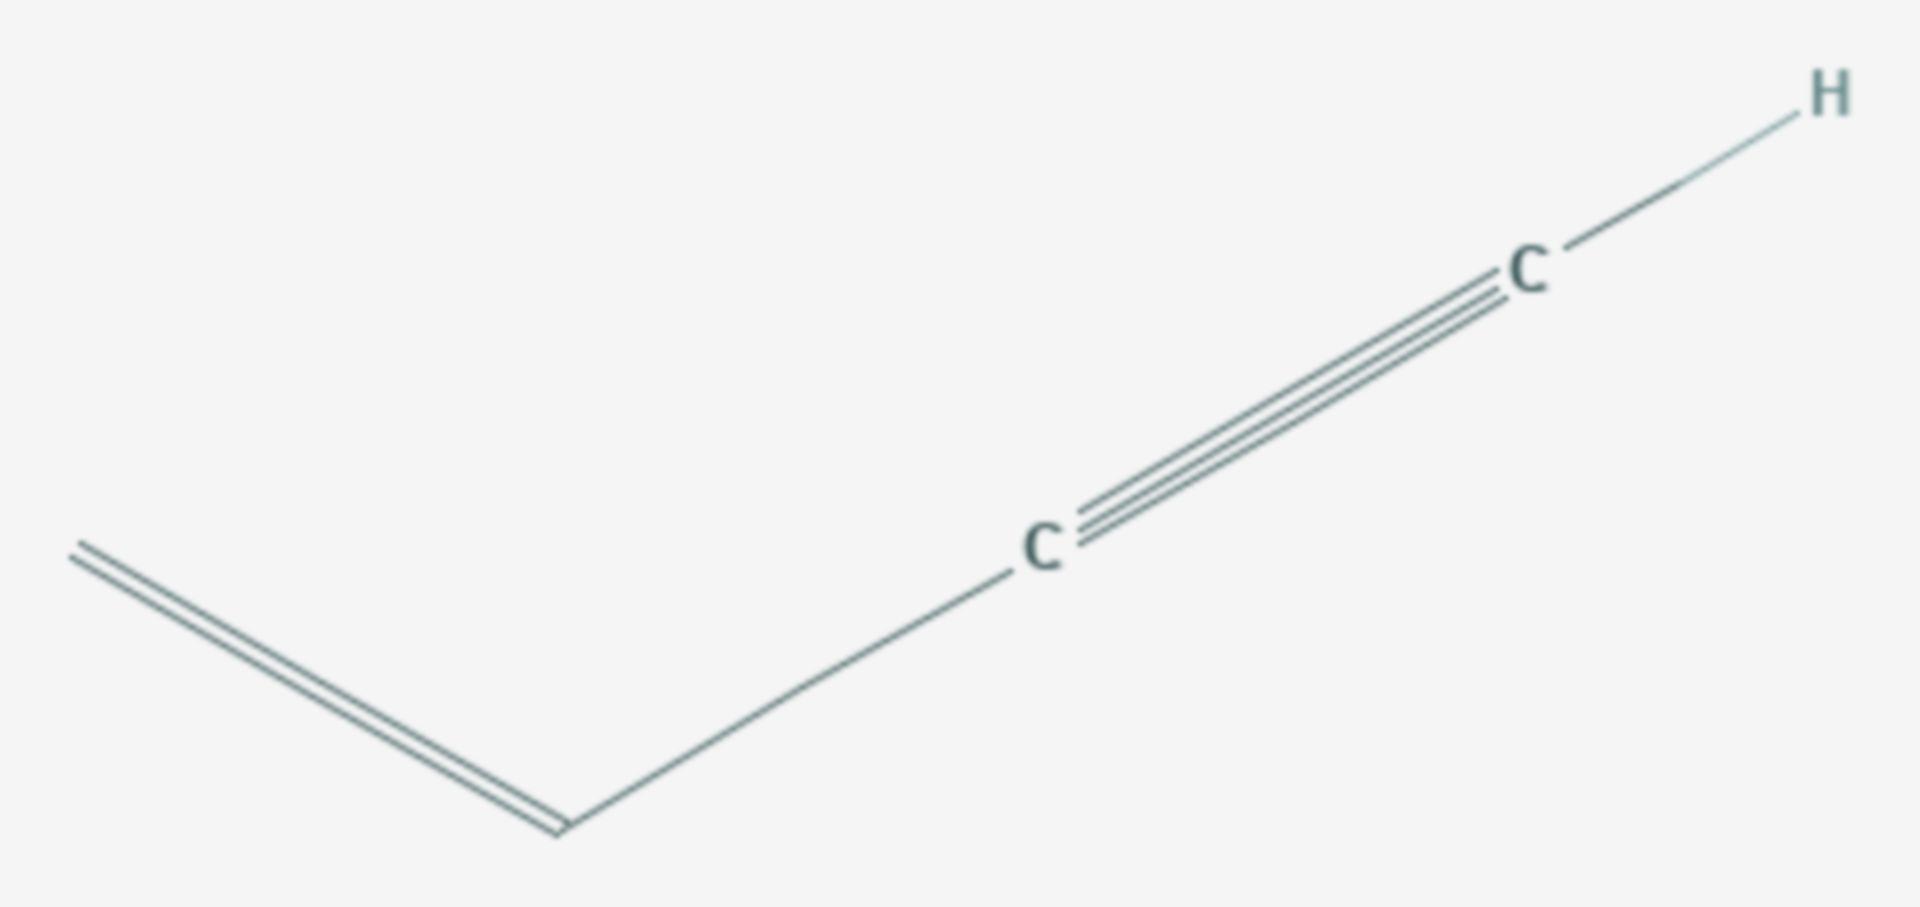 Butenin (Strukturformel)